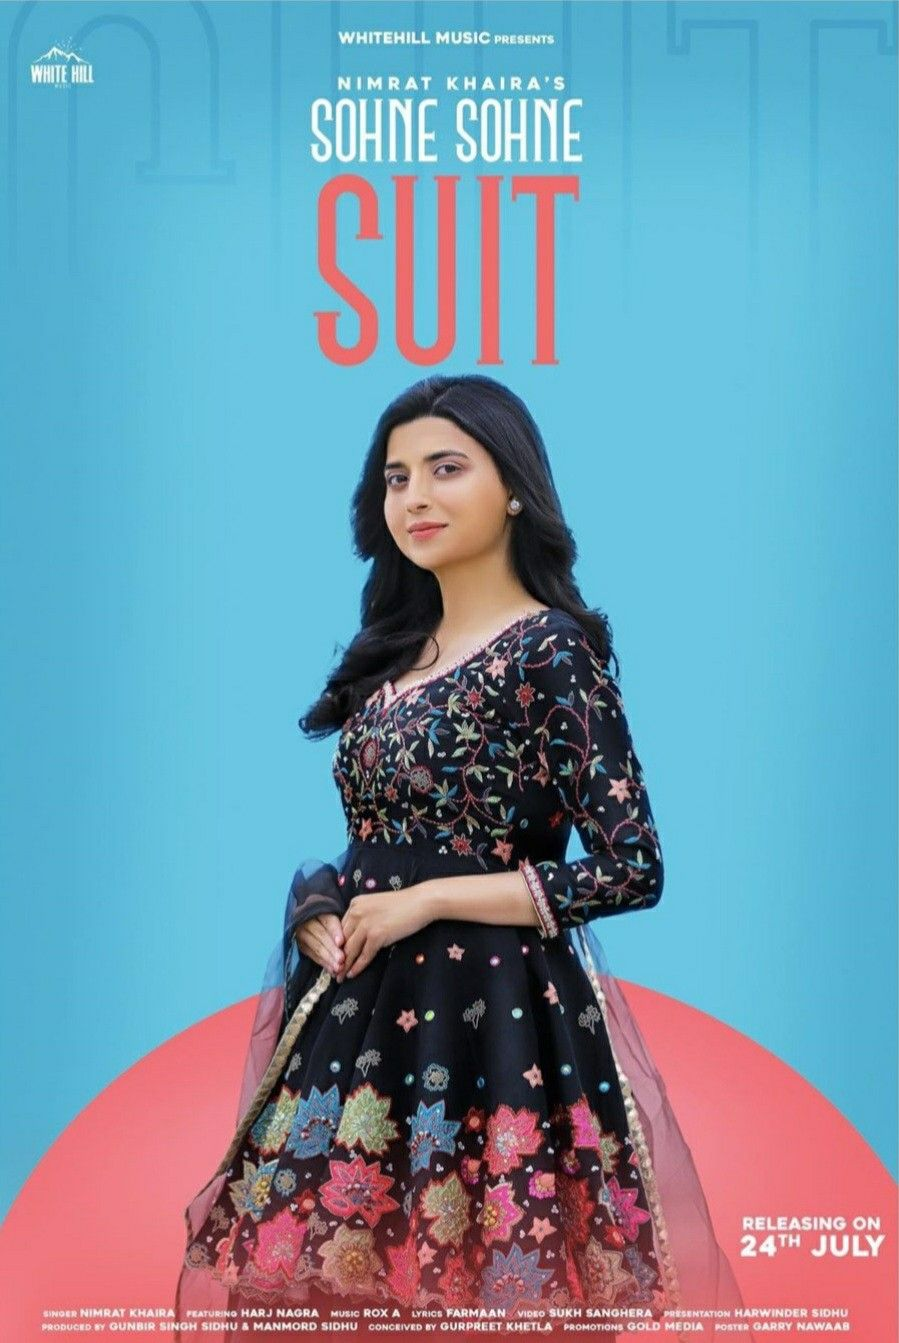 Pin by ℑlma 𝔖aiyad on Bollywood Gupsup in 2020 Nimrat